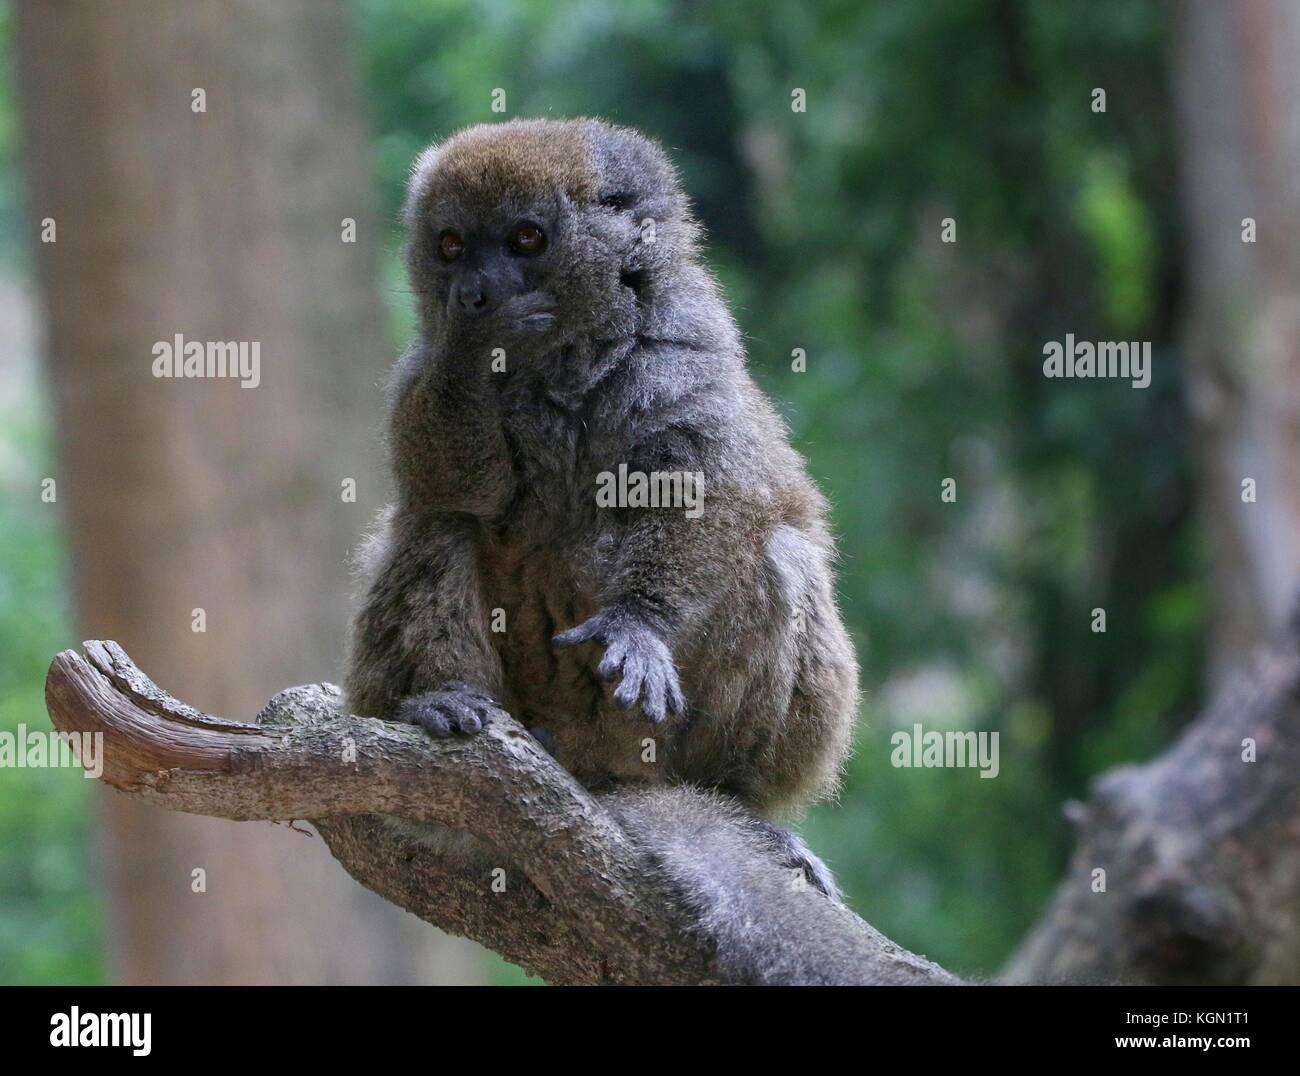 Madagascar Lac Alaotra bamboo lemur (Hapalemur alaotrensis), a.k.a. Alaotran gentle lemur - Stock Image